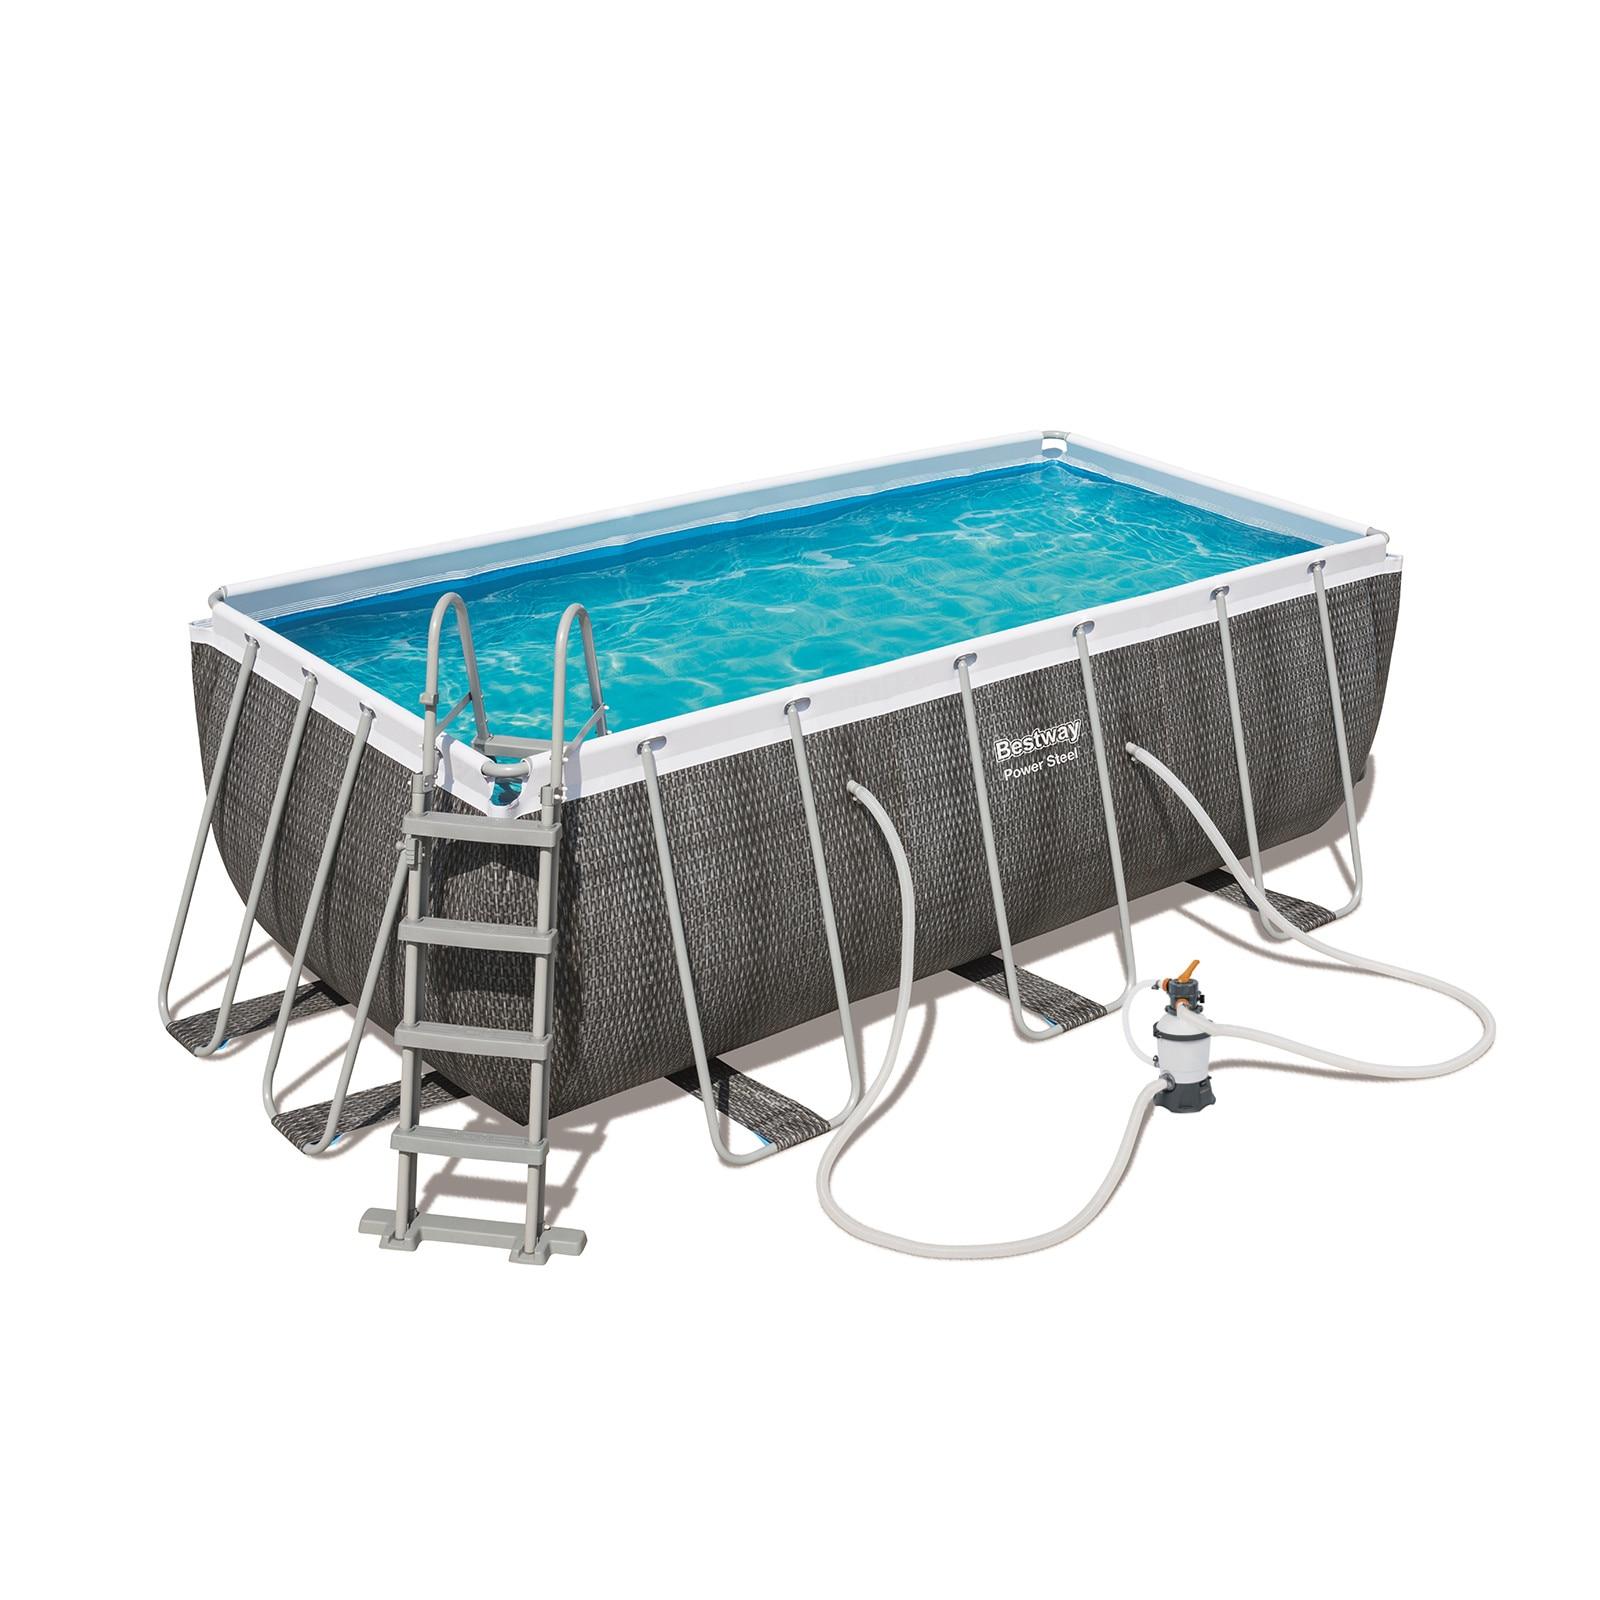 Bestway Removable Pool Tubular Power Steel Design Rattan 412 Cm X 201 Cm X 122 Cm-56722Sf-